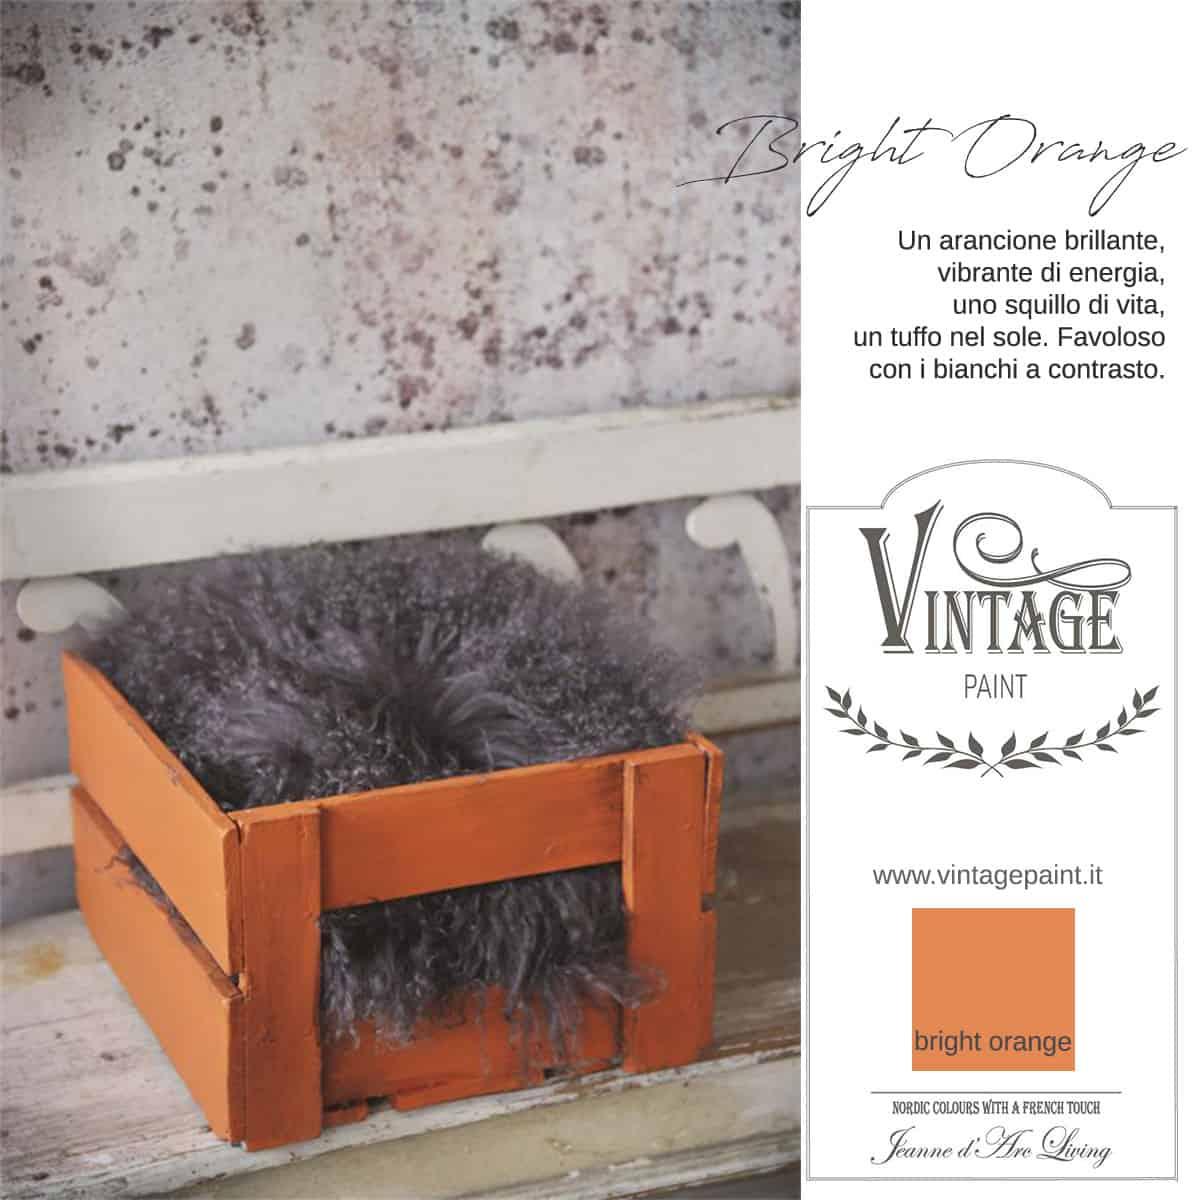 bright orange arancione vintage chalk paint vernici shabby chic autentico look gesso